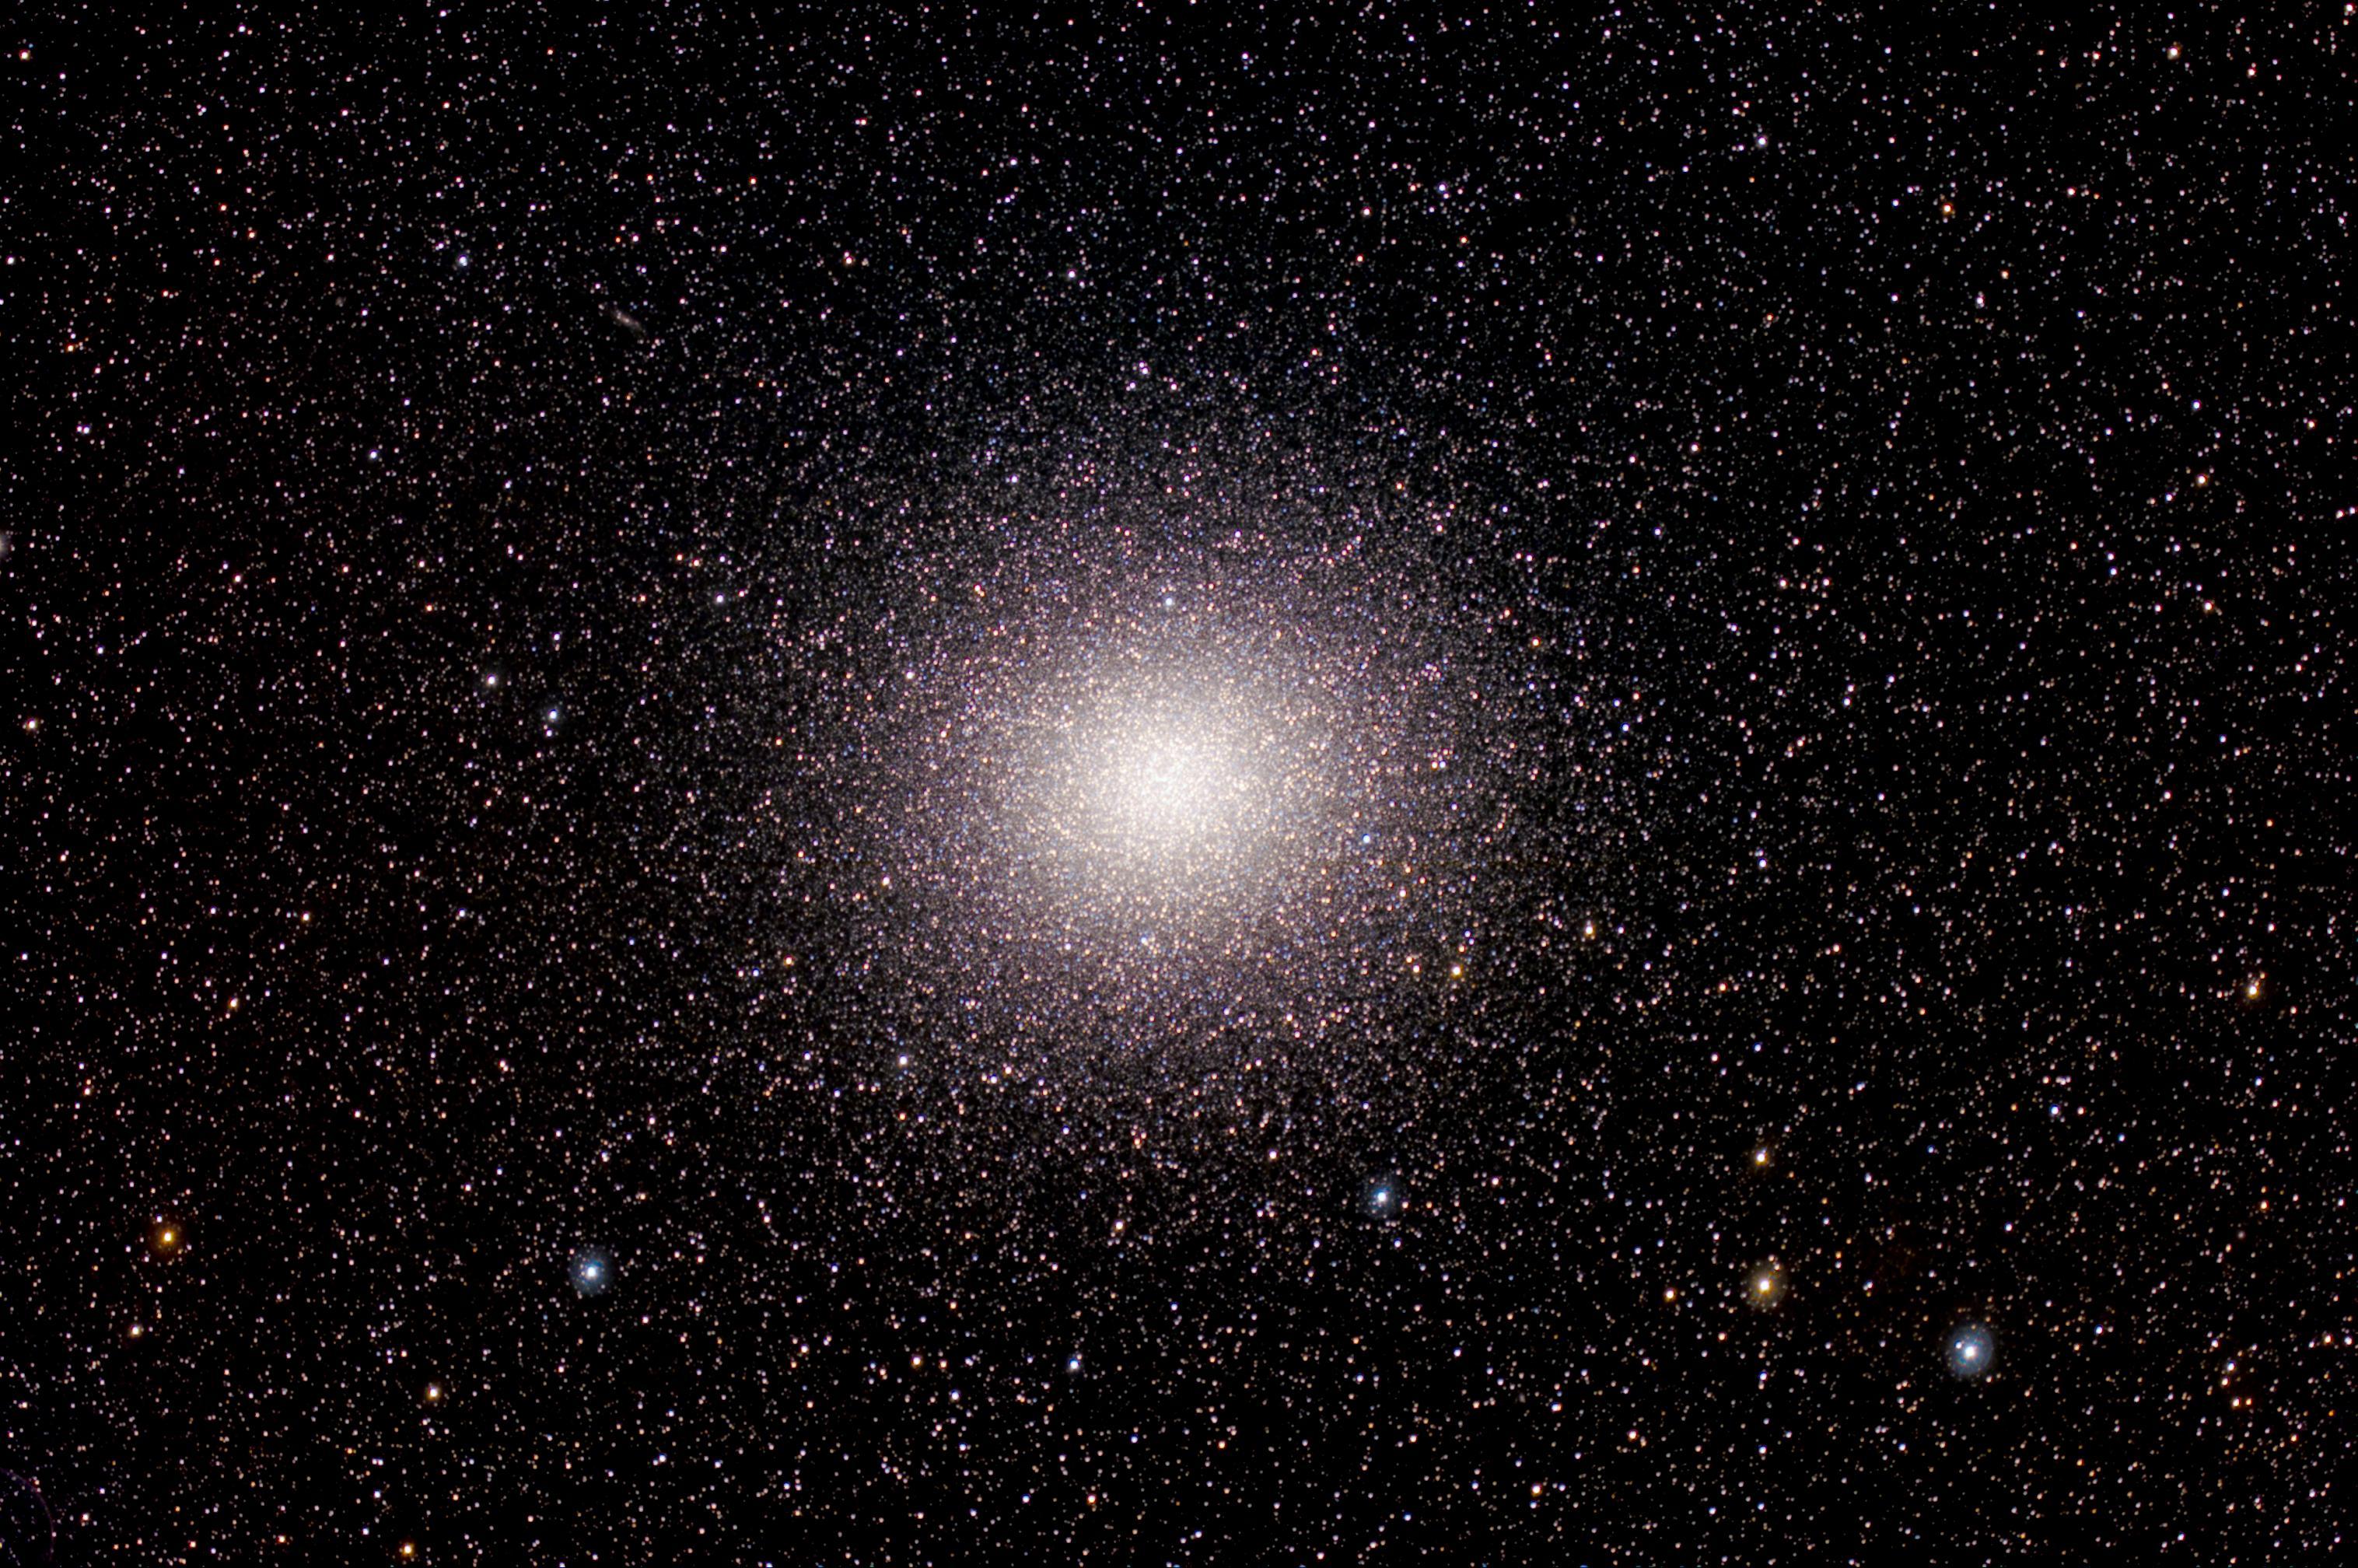 APOD: 2010 March 31 - Millions of Stars in Omega Centauri